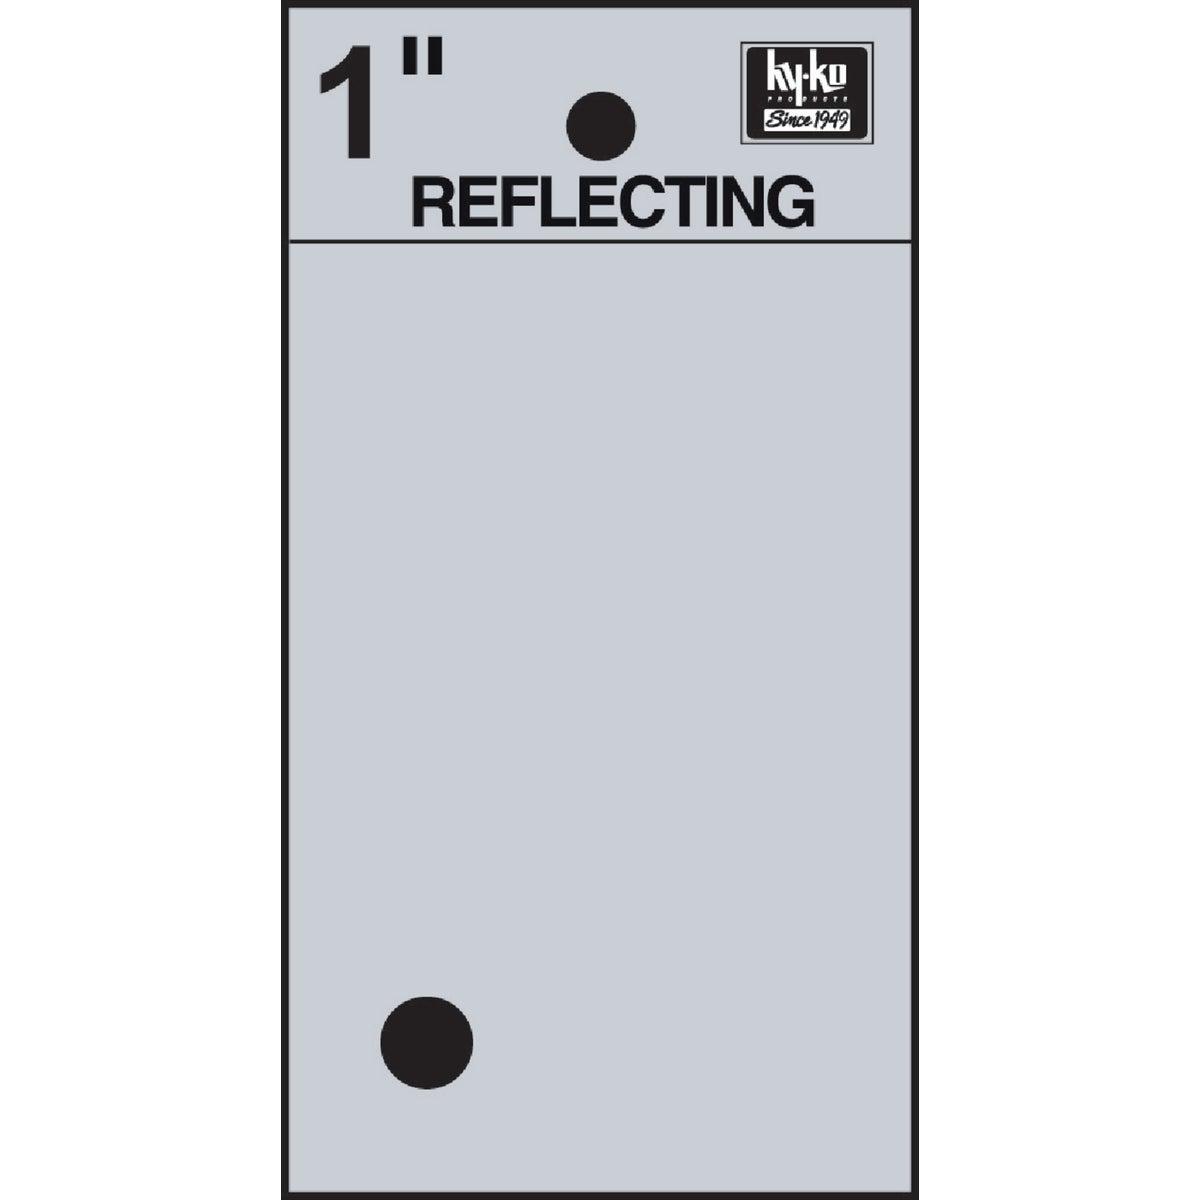 "1"" REFLECT PERIOD"